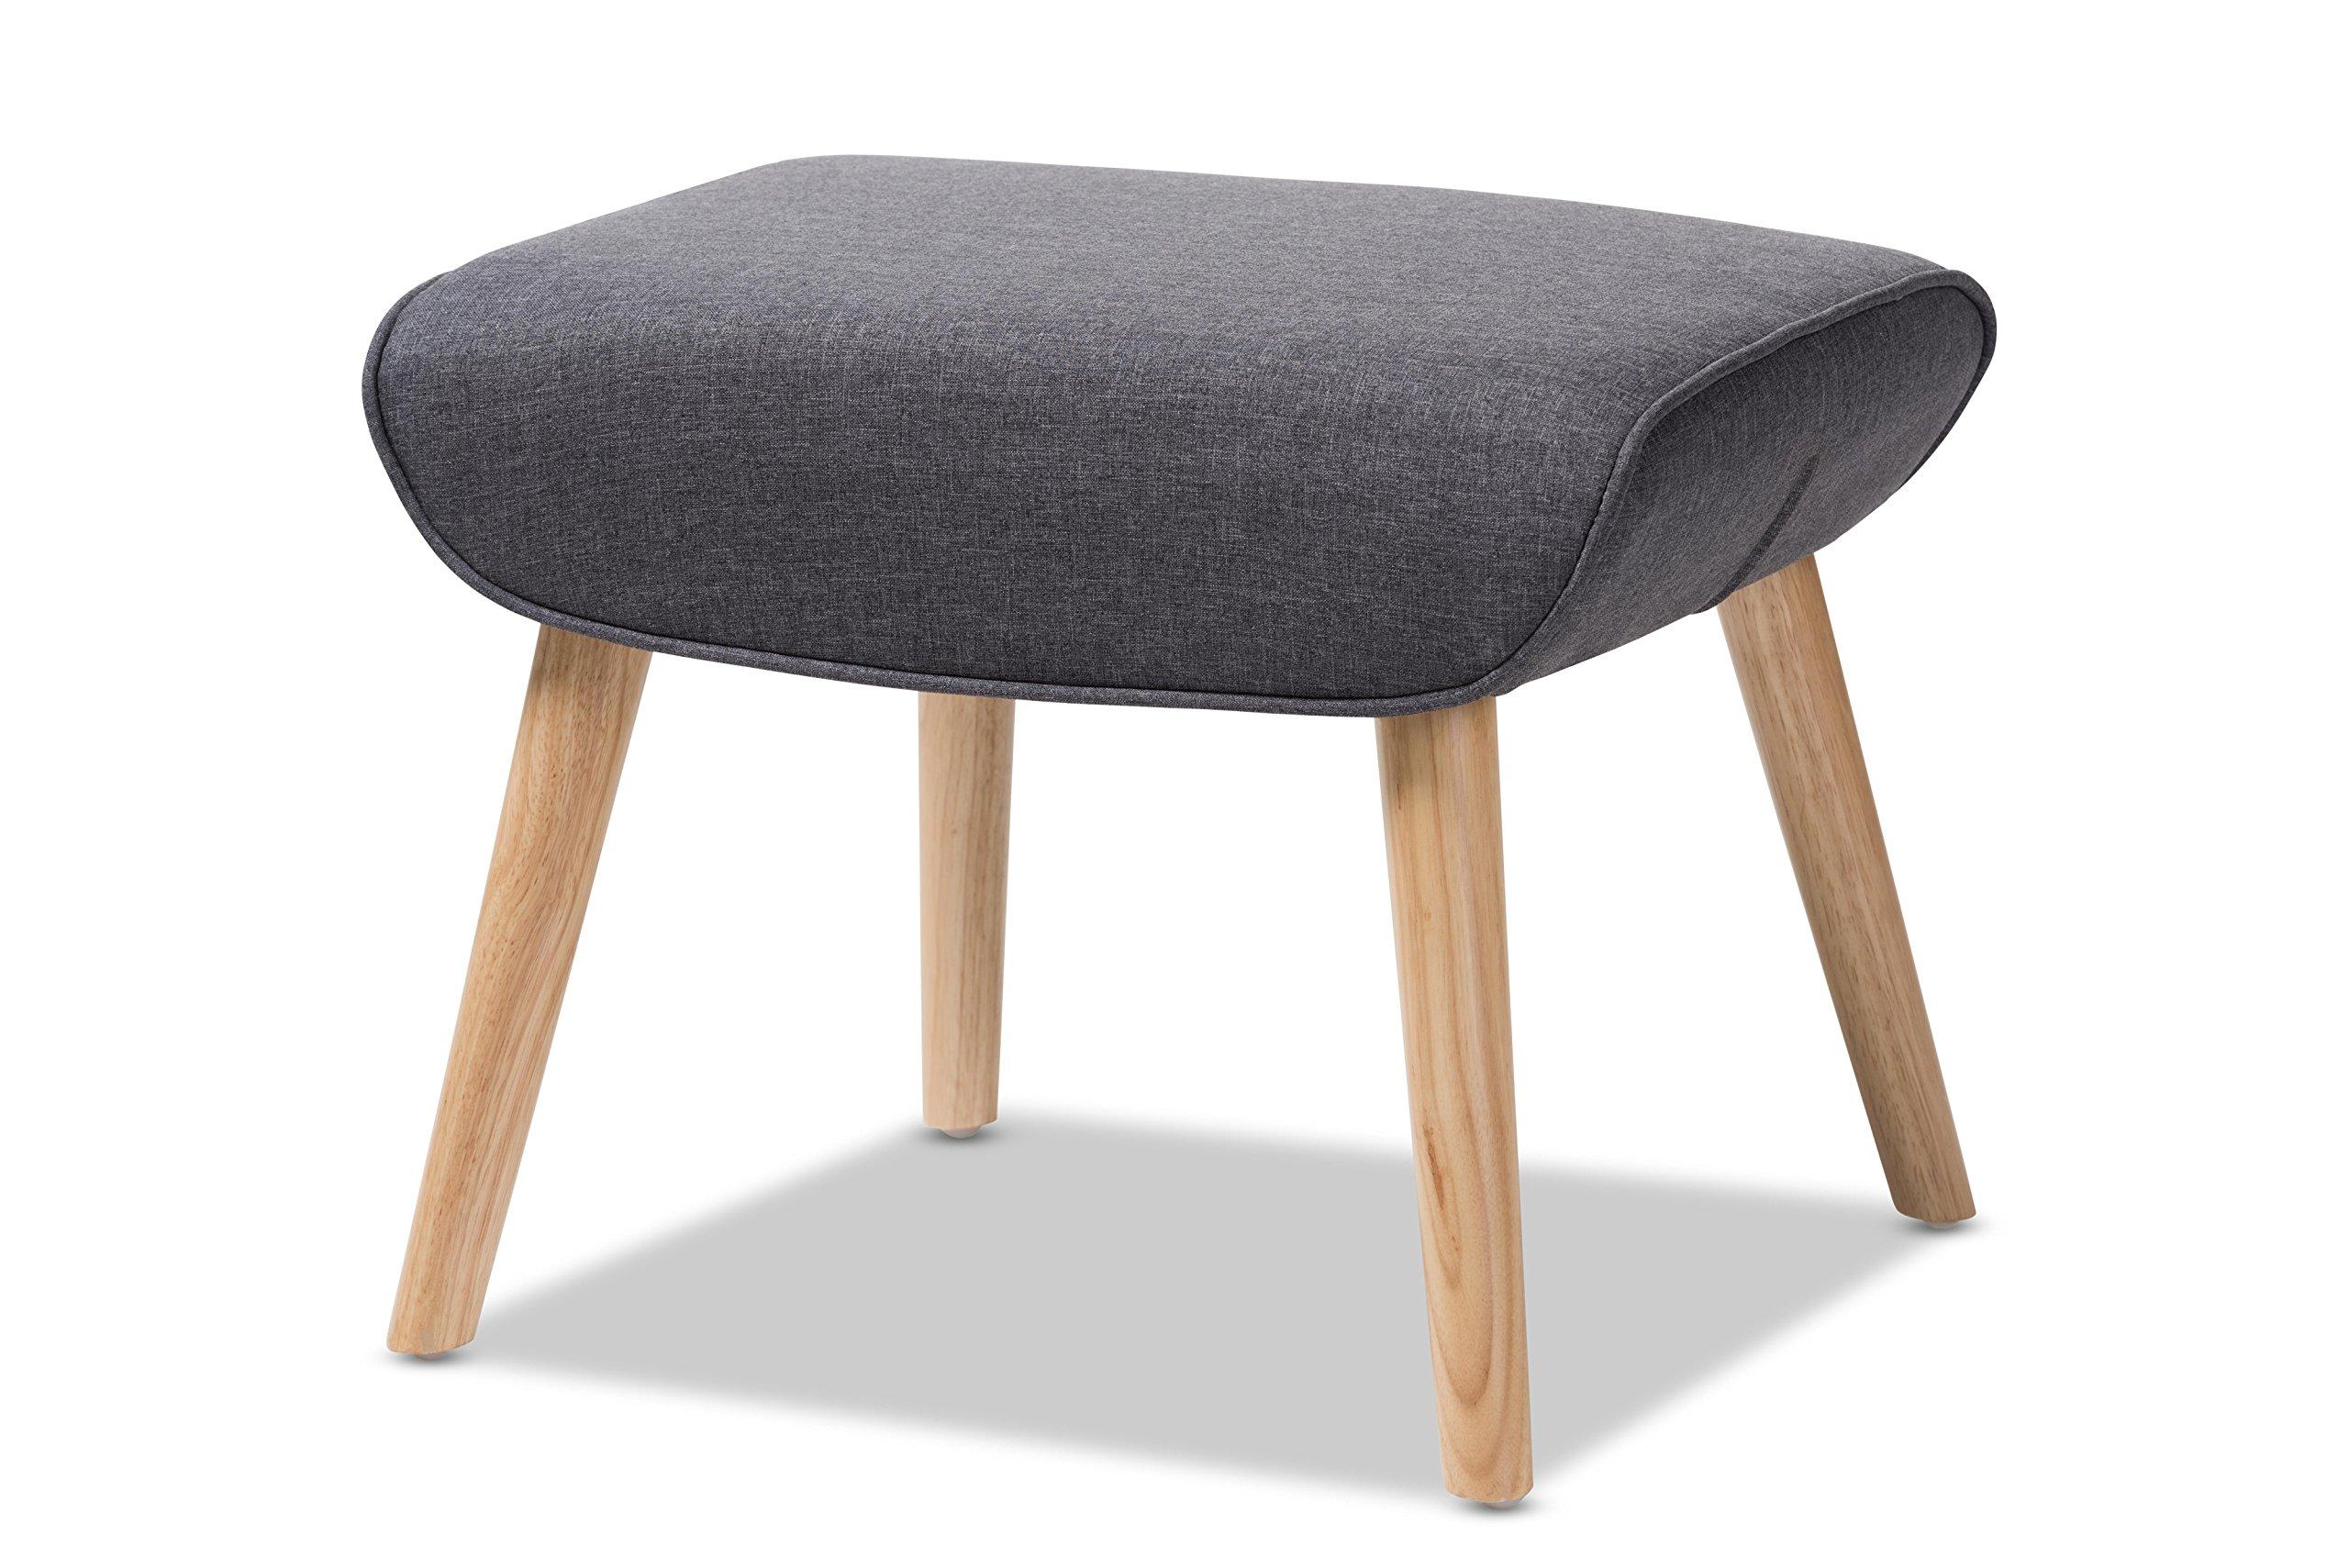 Baxton Studio 424-8130-AMZ Payton Mid-Century Modern Fabric Upholstered Natural Finished Wood Ottoman, Dark Grey